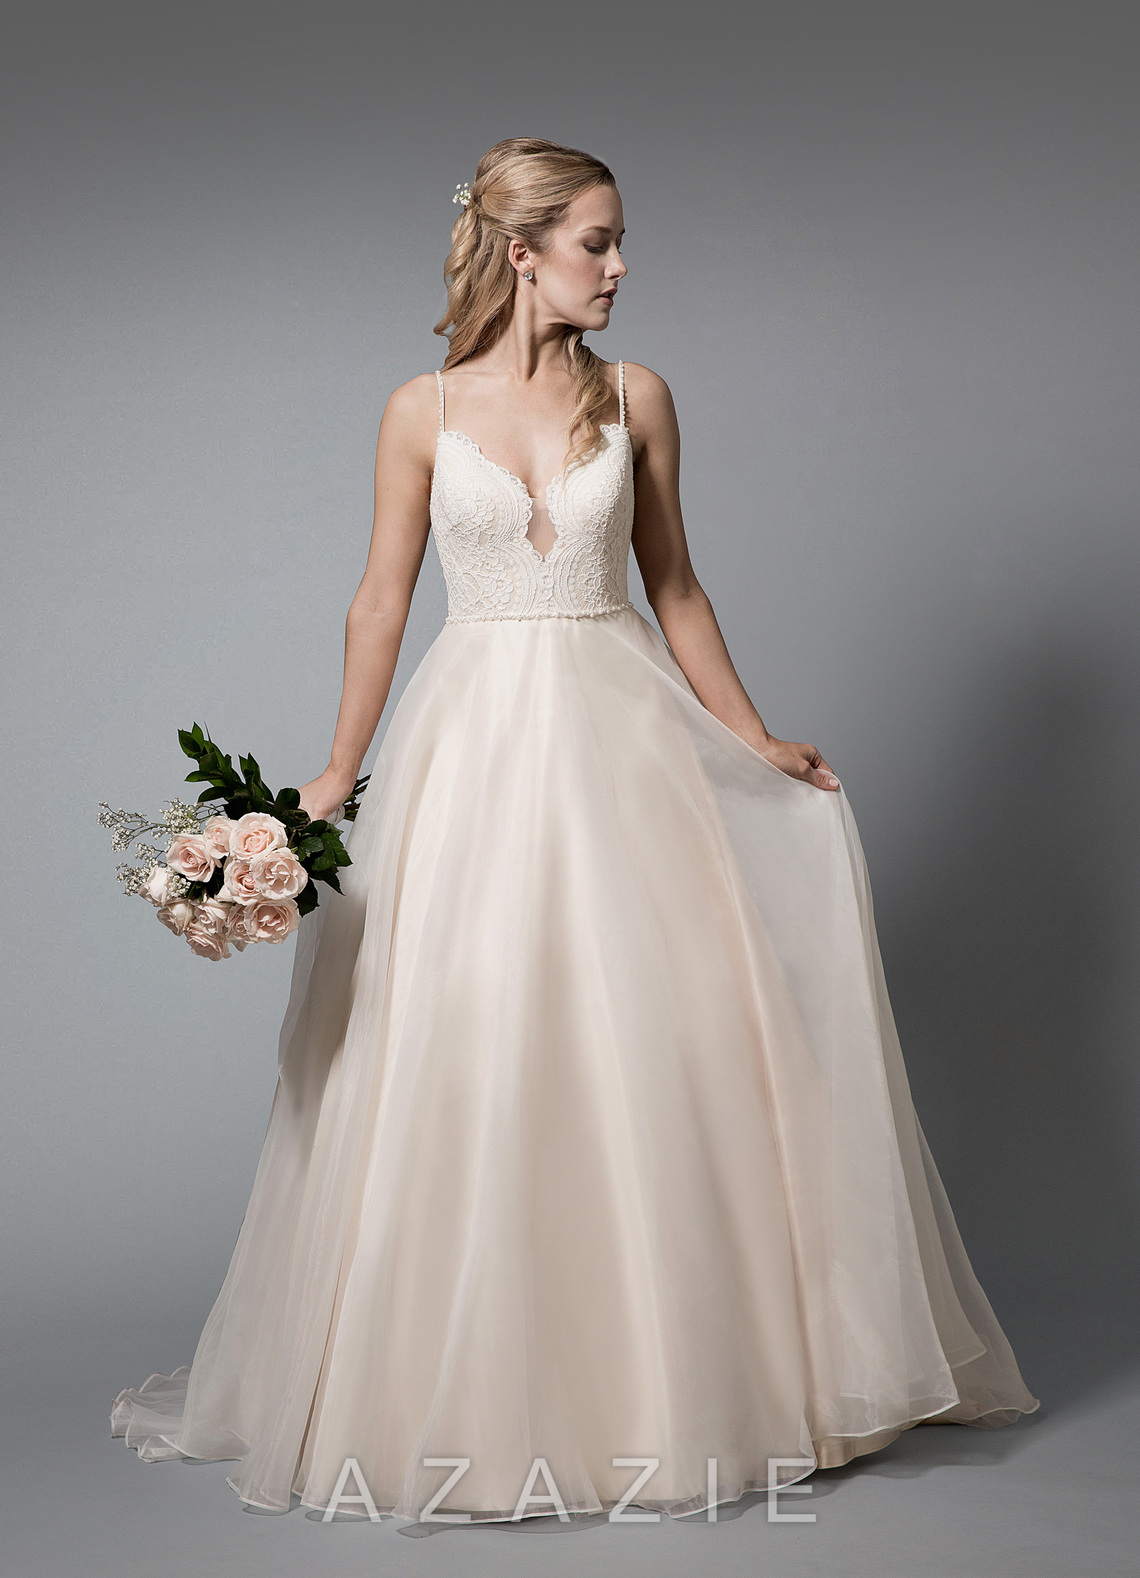 90eaecab9a9 Azazie Florence BG Wedding Dress